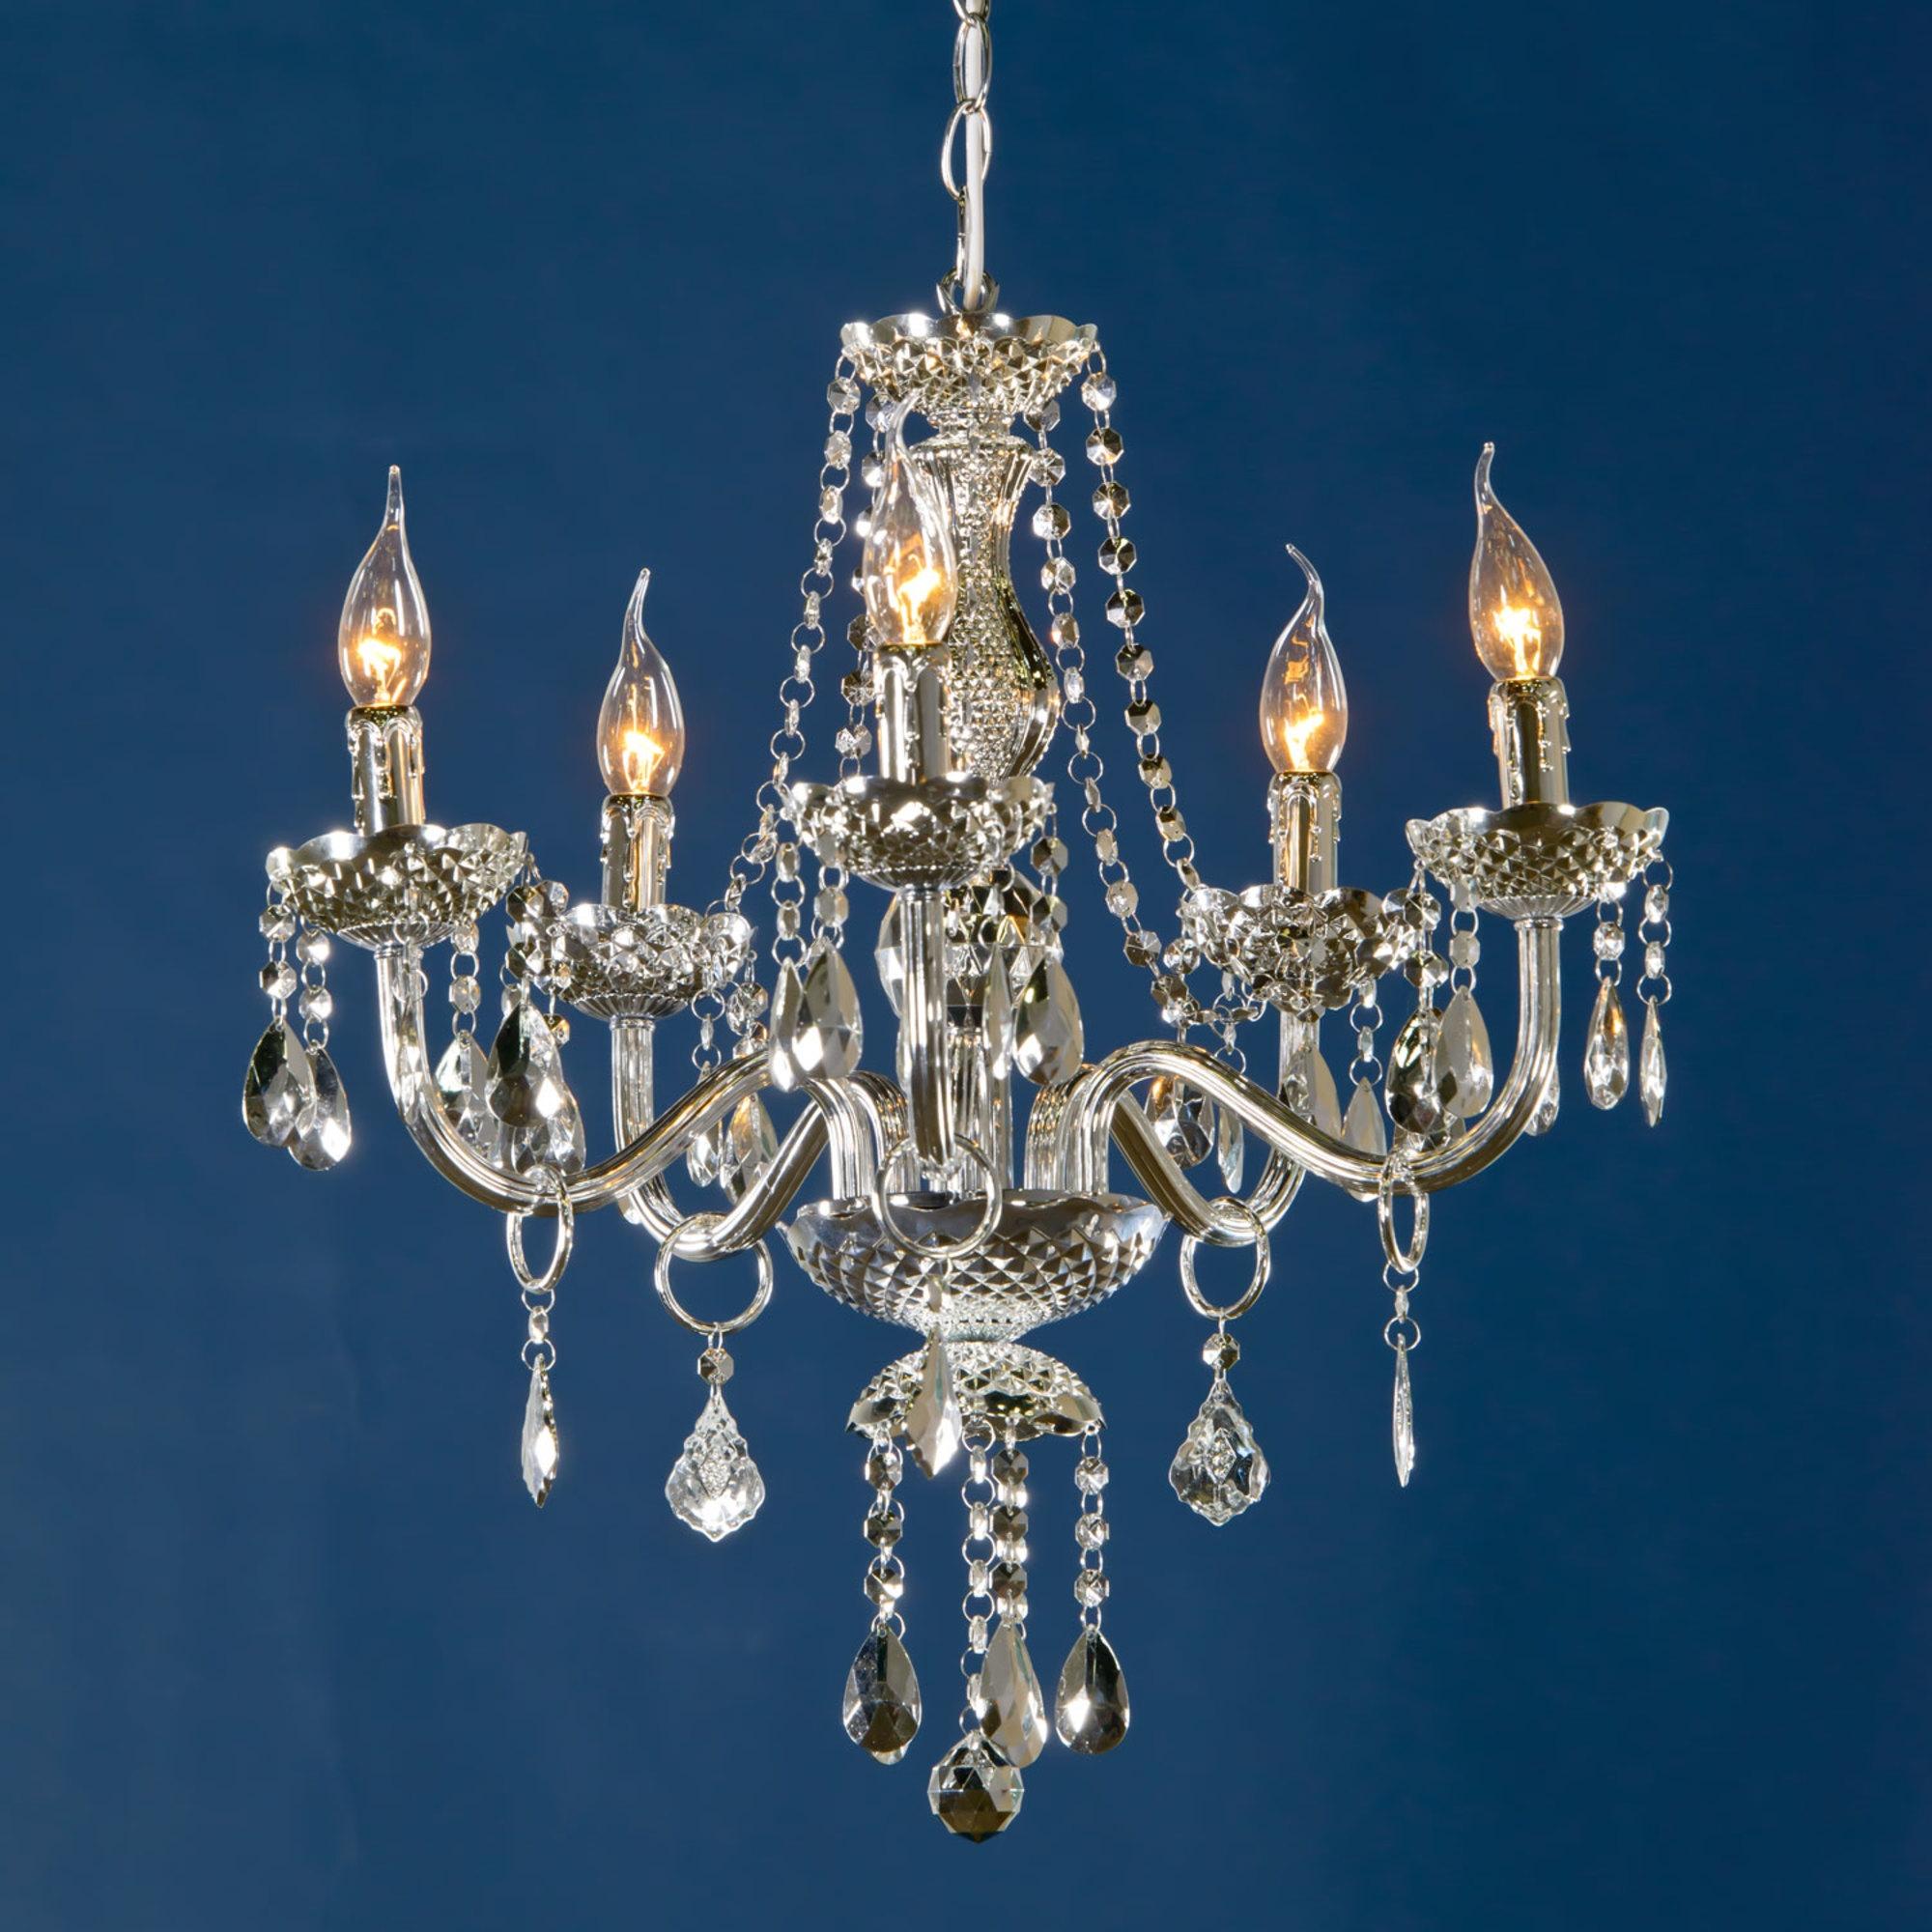 Glimmer 5 Light Chandelier - Silver